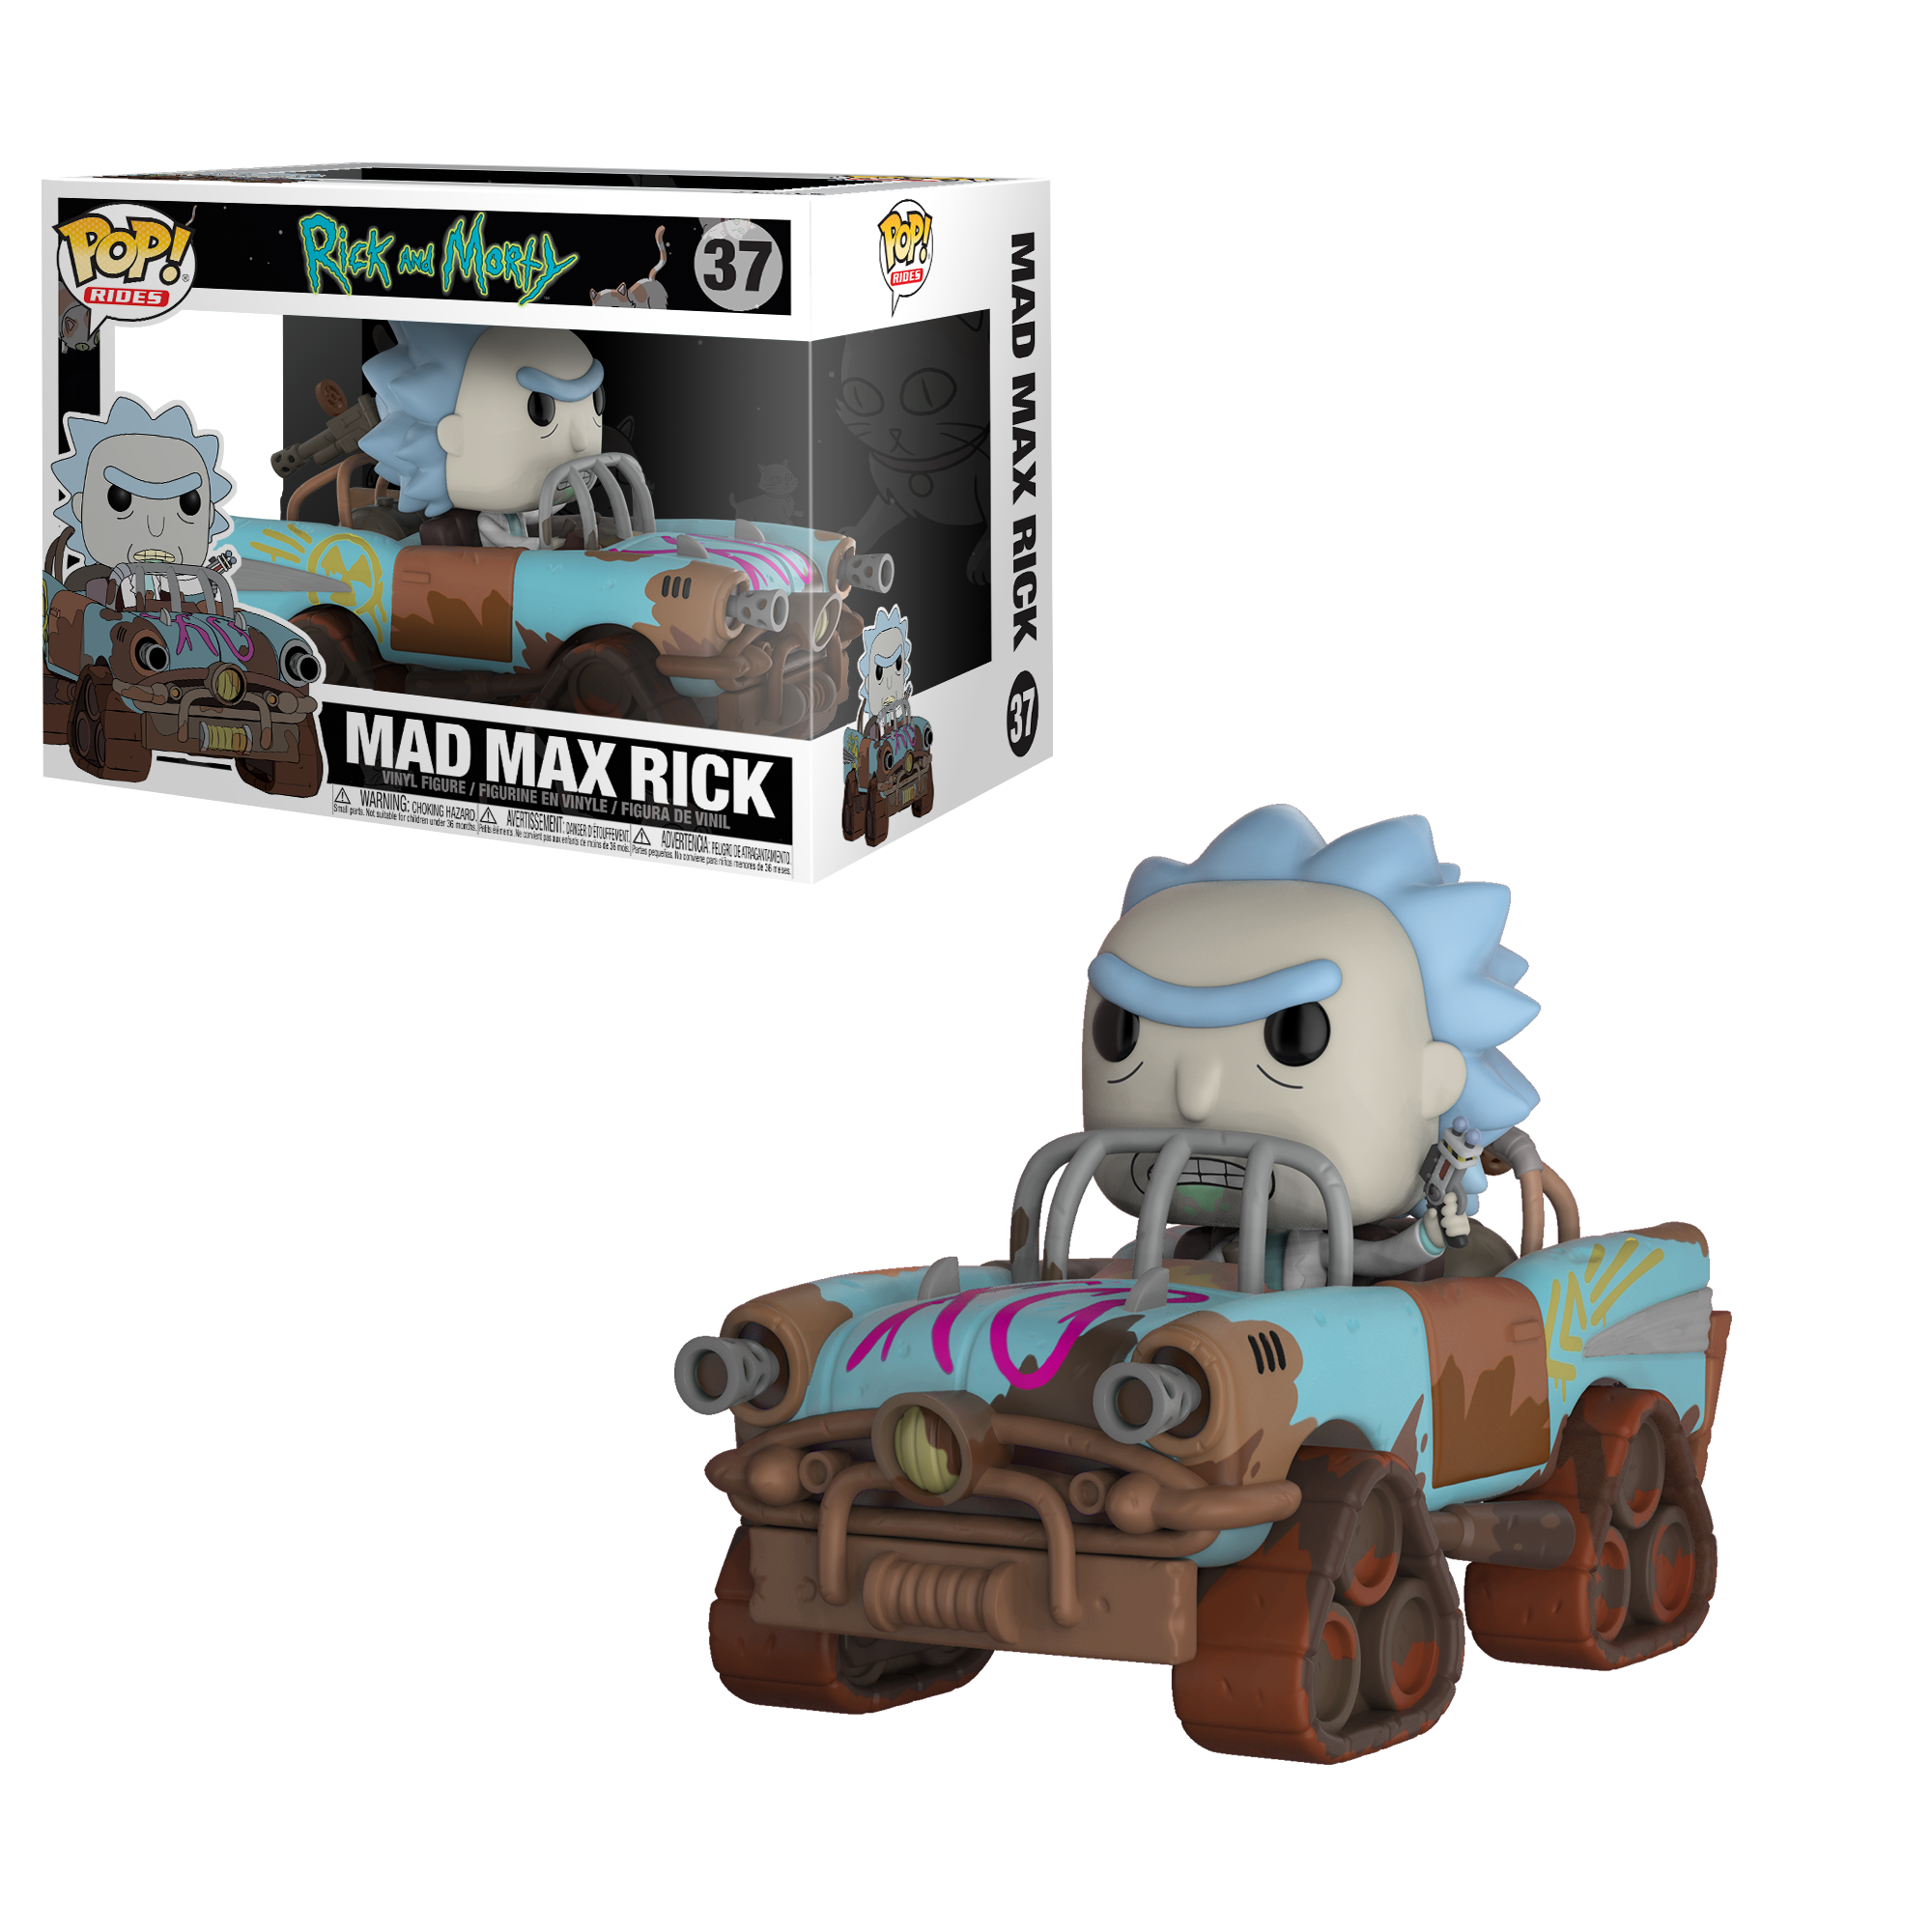 Rick And Morty Mad Max Rick Funko Pop Ride Vinyl